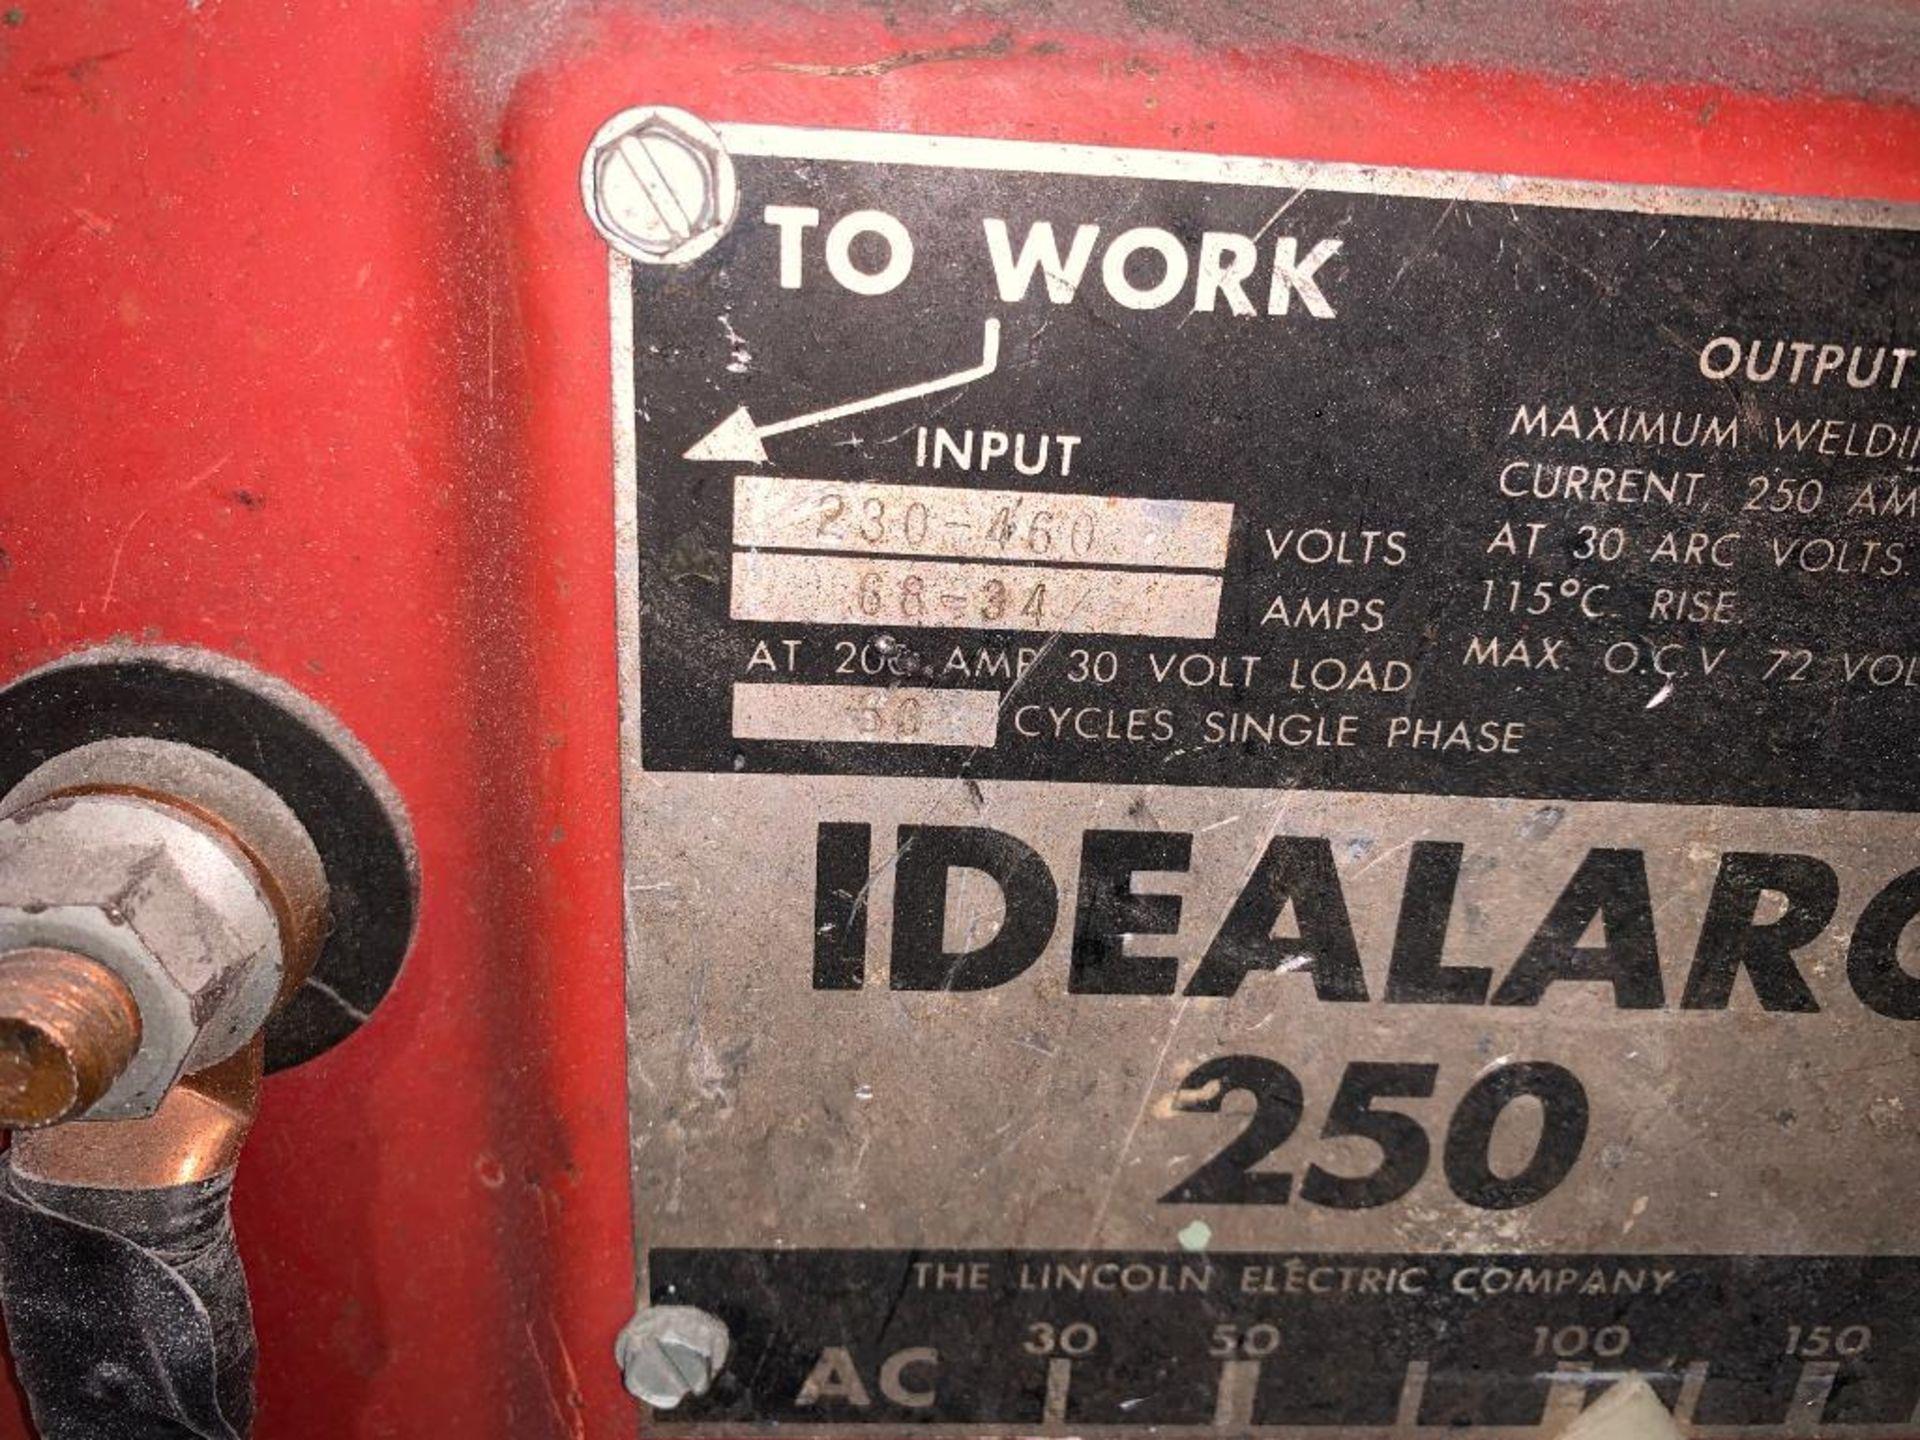 Lincoln Idealarc 250 stick welder - Image 3 of 8